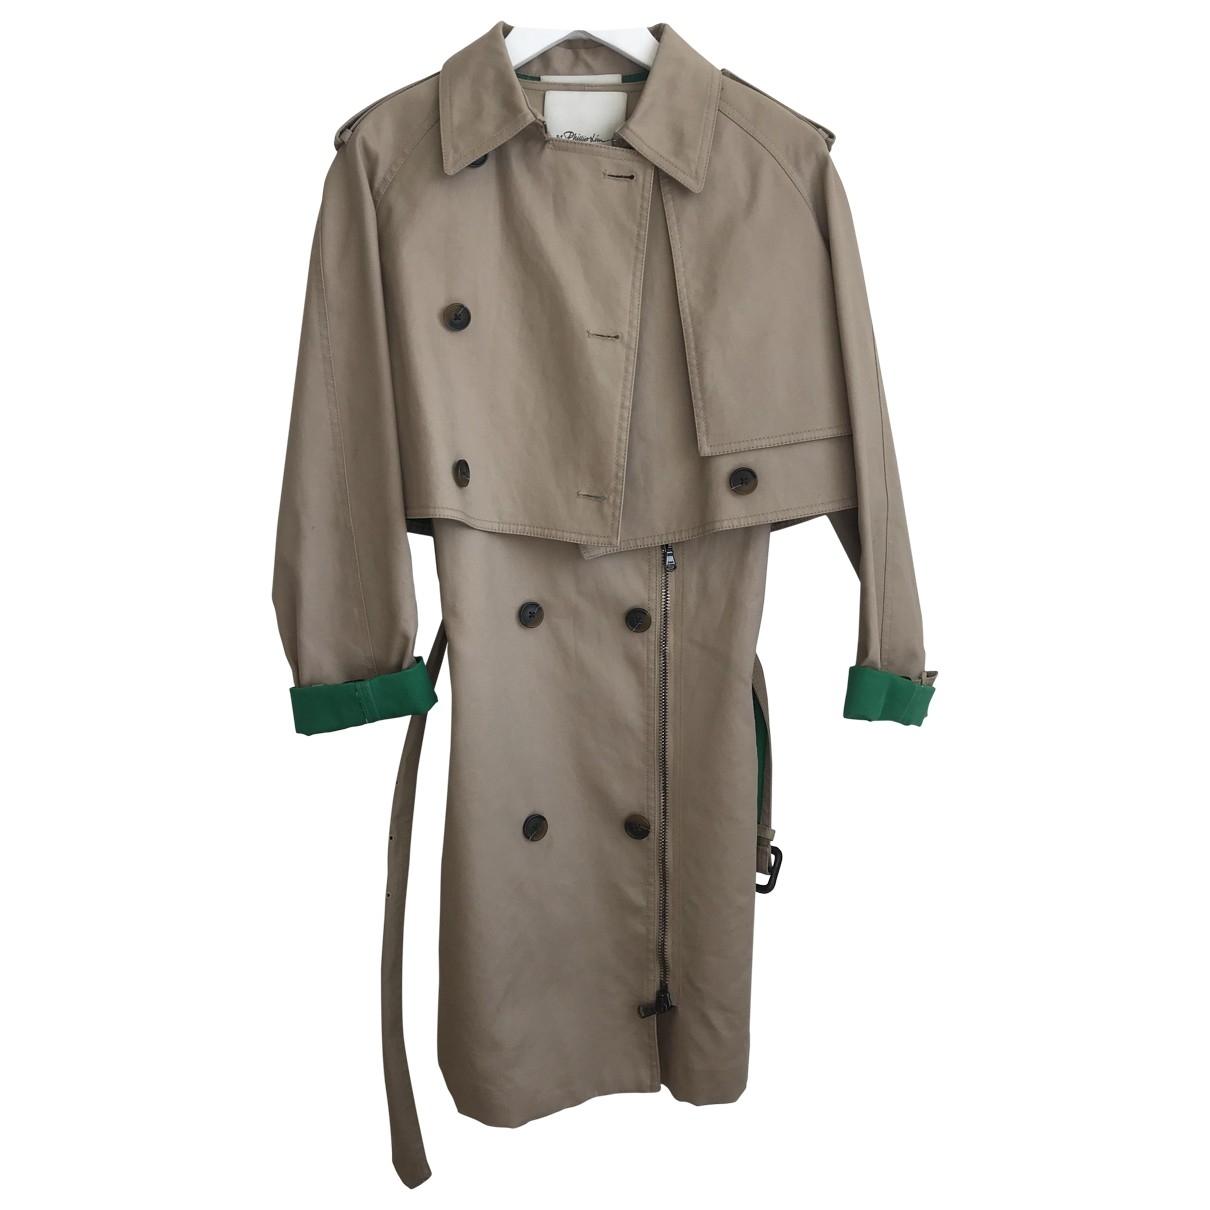 3.1 Phillip Lim \N Beige Cotton coat for Women 0 0-5